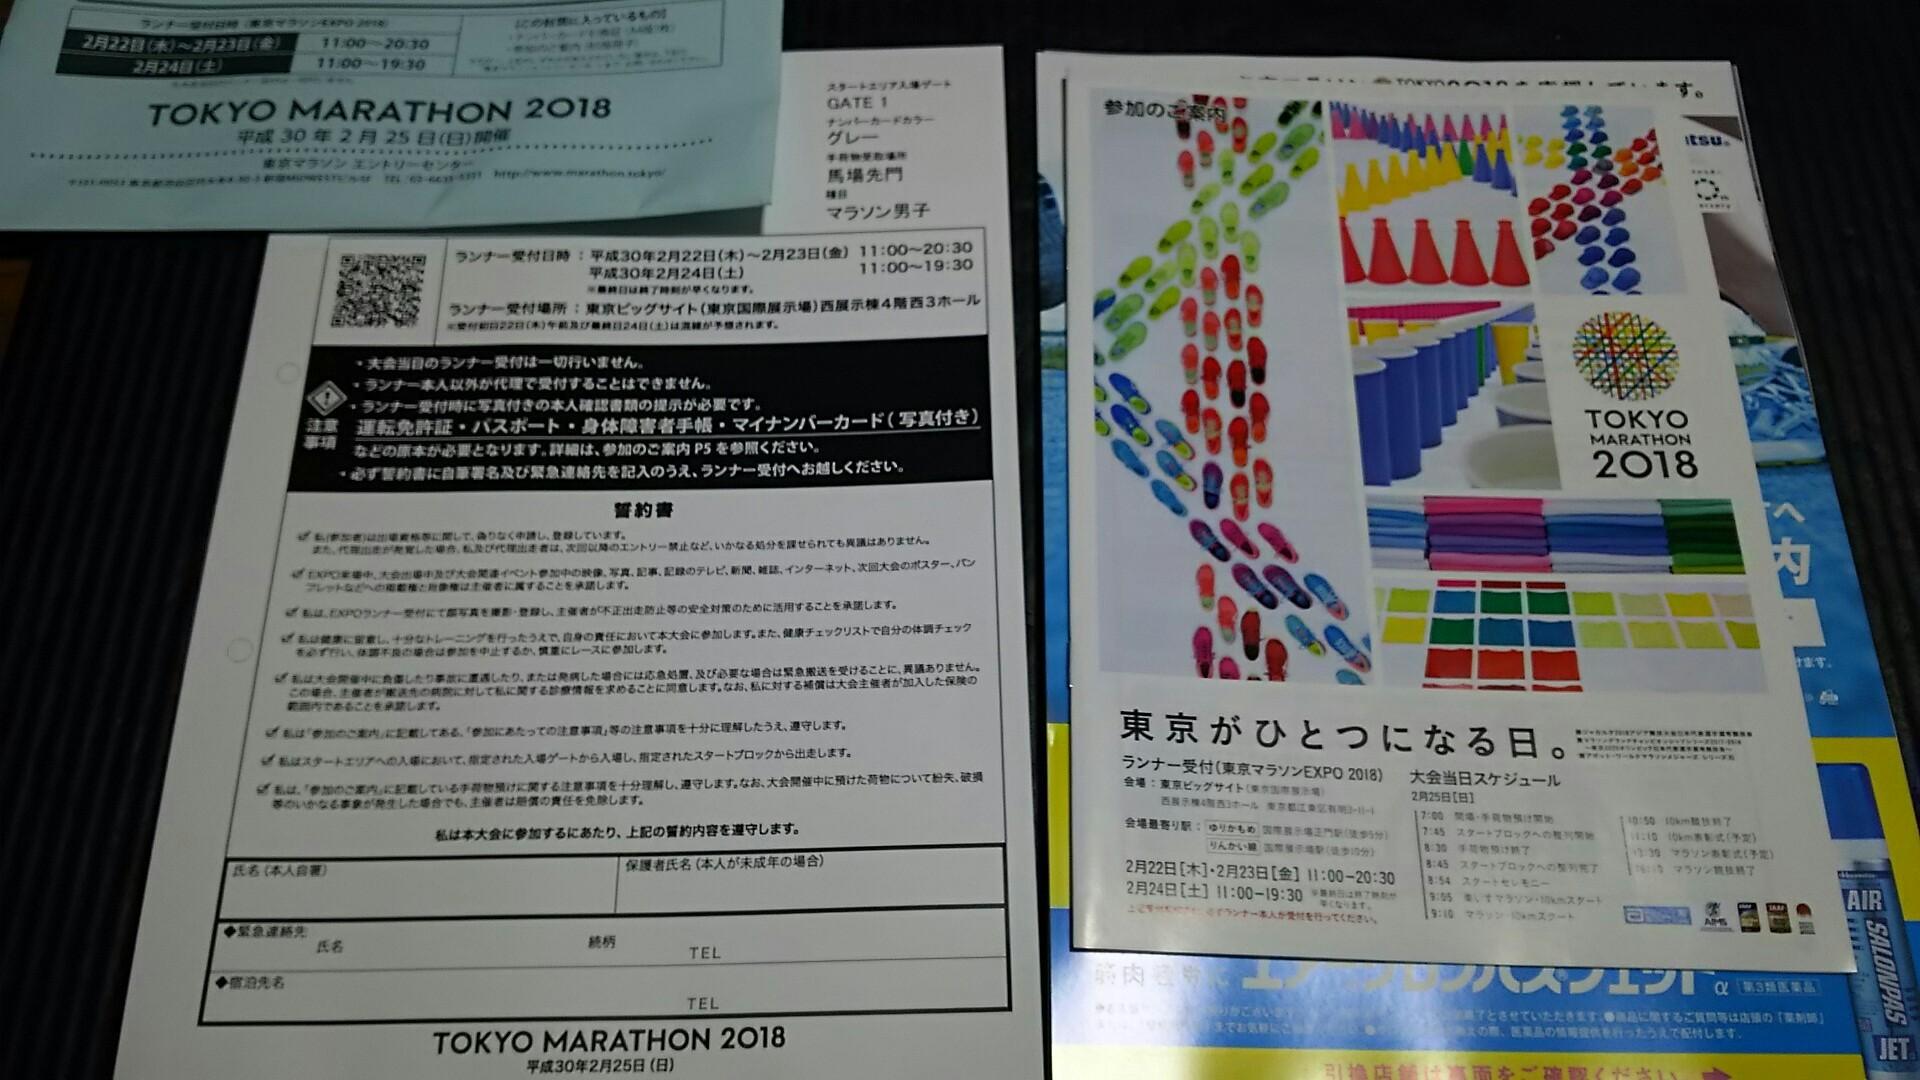 IMG_20180129_191607.jpg